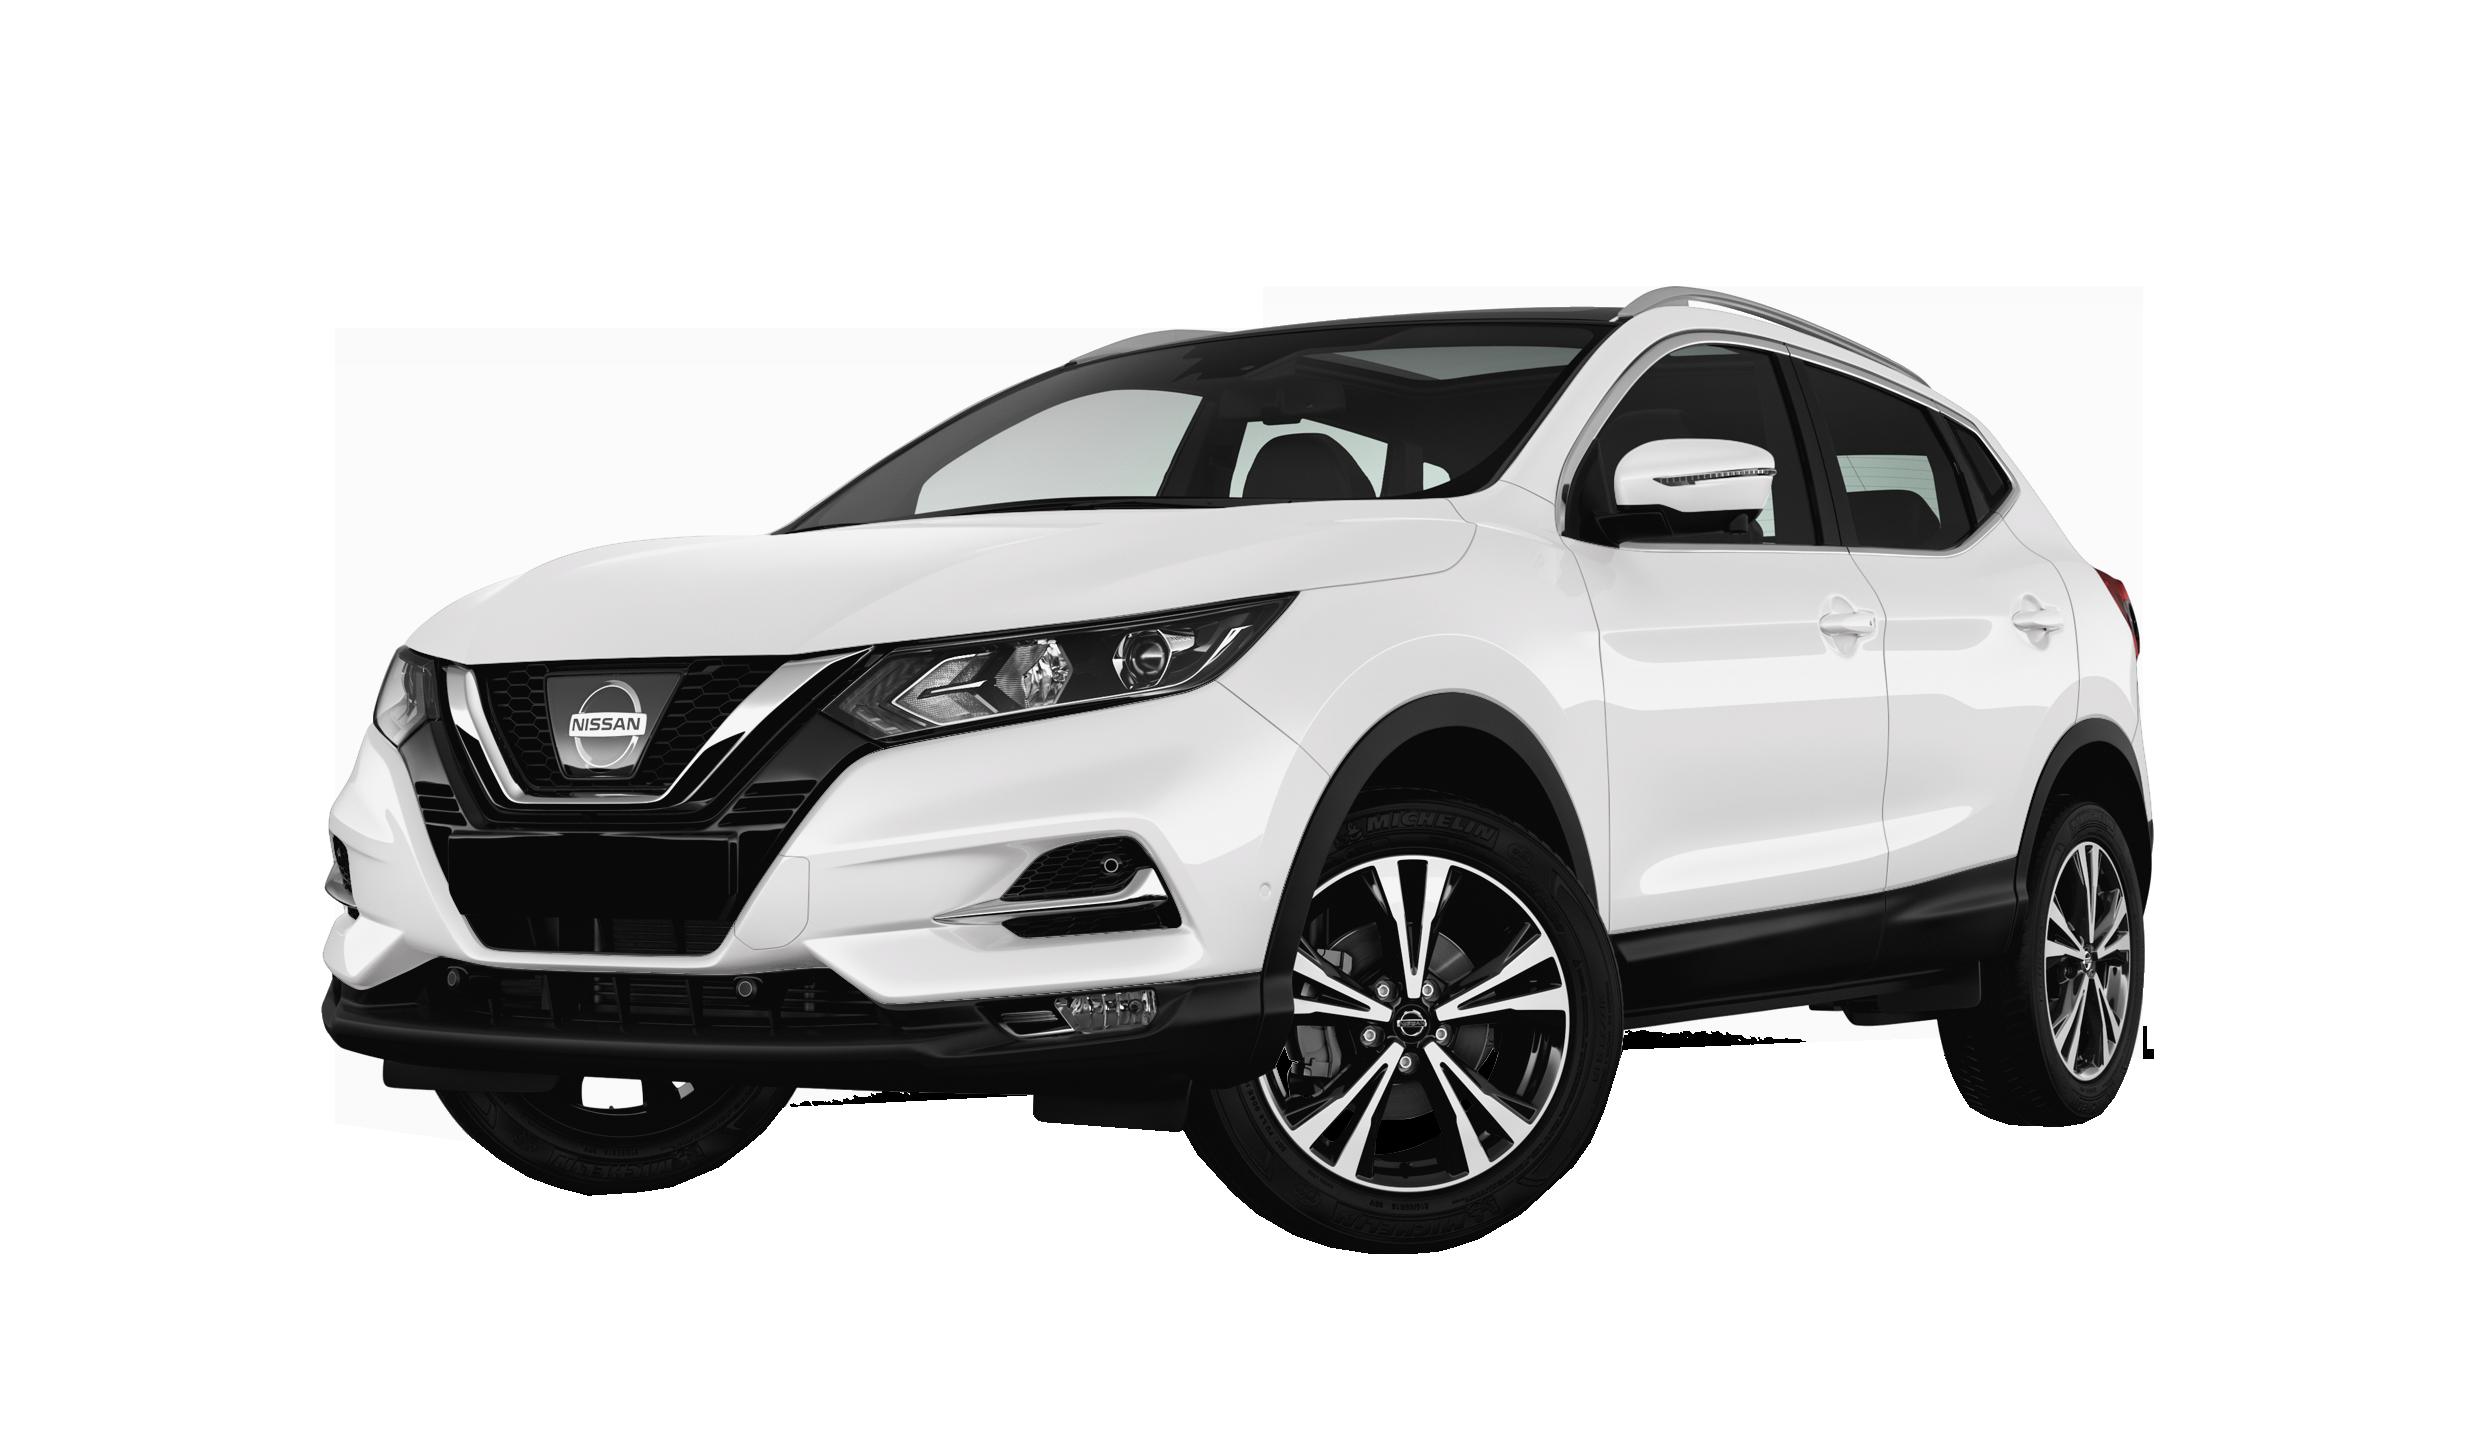 Midsized(Car/SUV/Crossover)